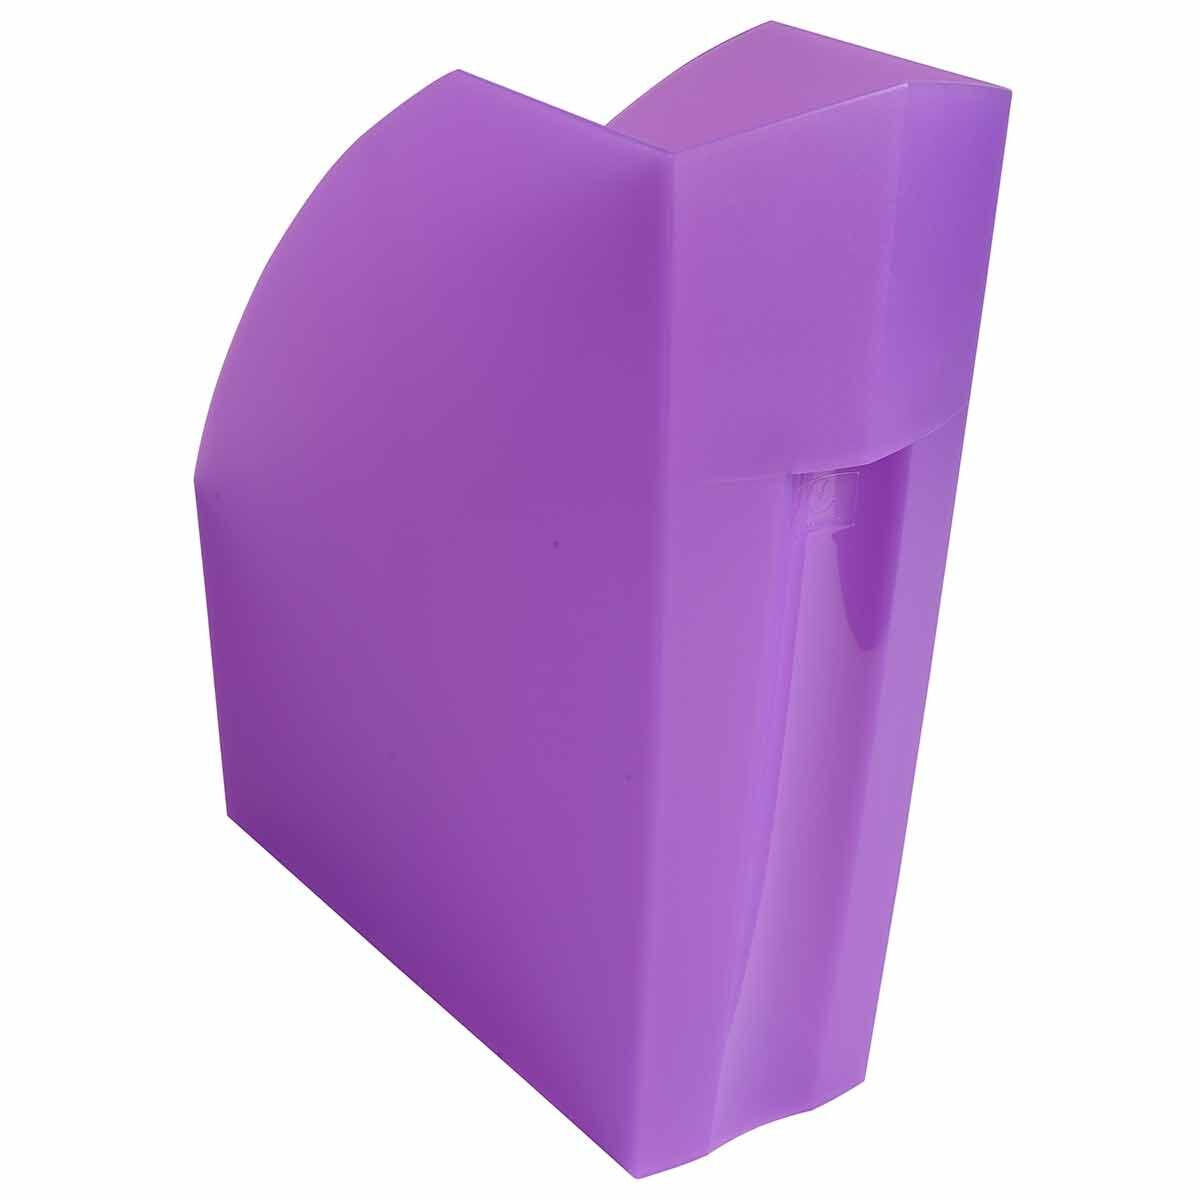 Exacompta Linicolor Magazine File Pack of 3 Purple